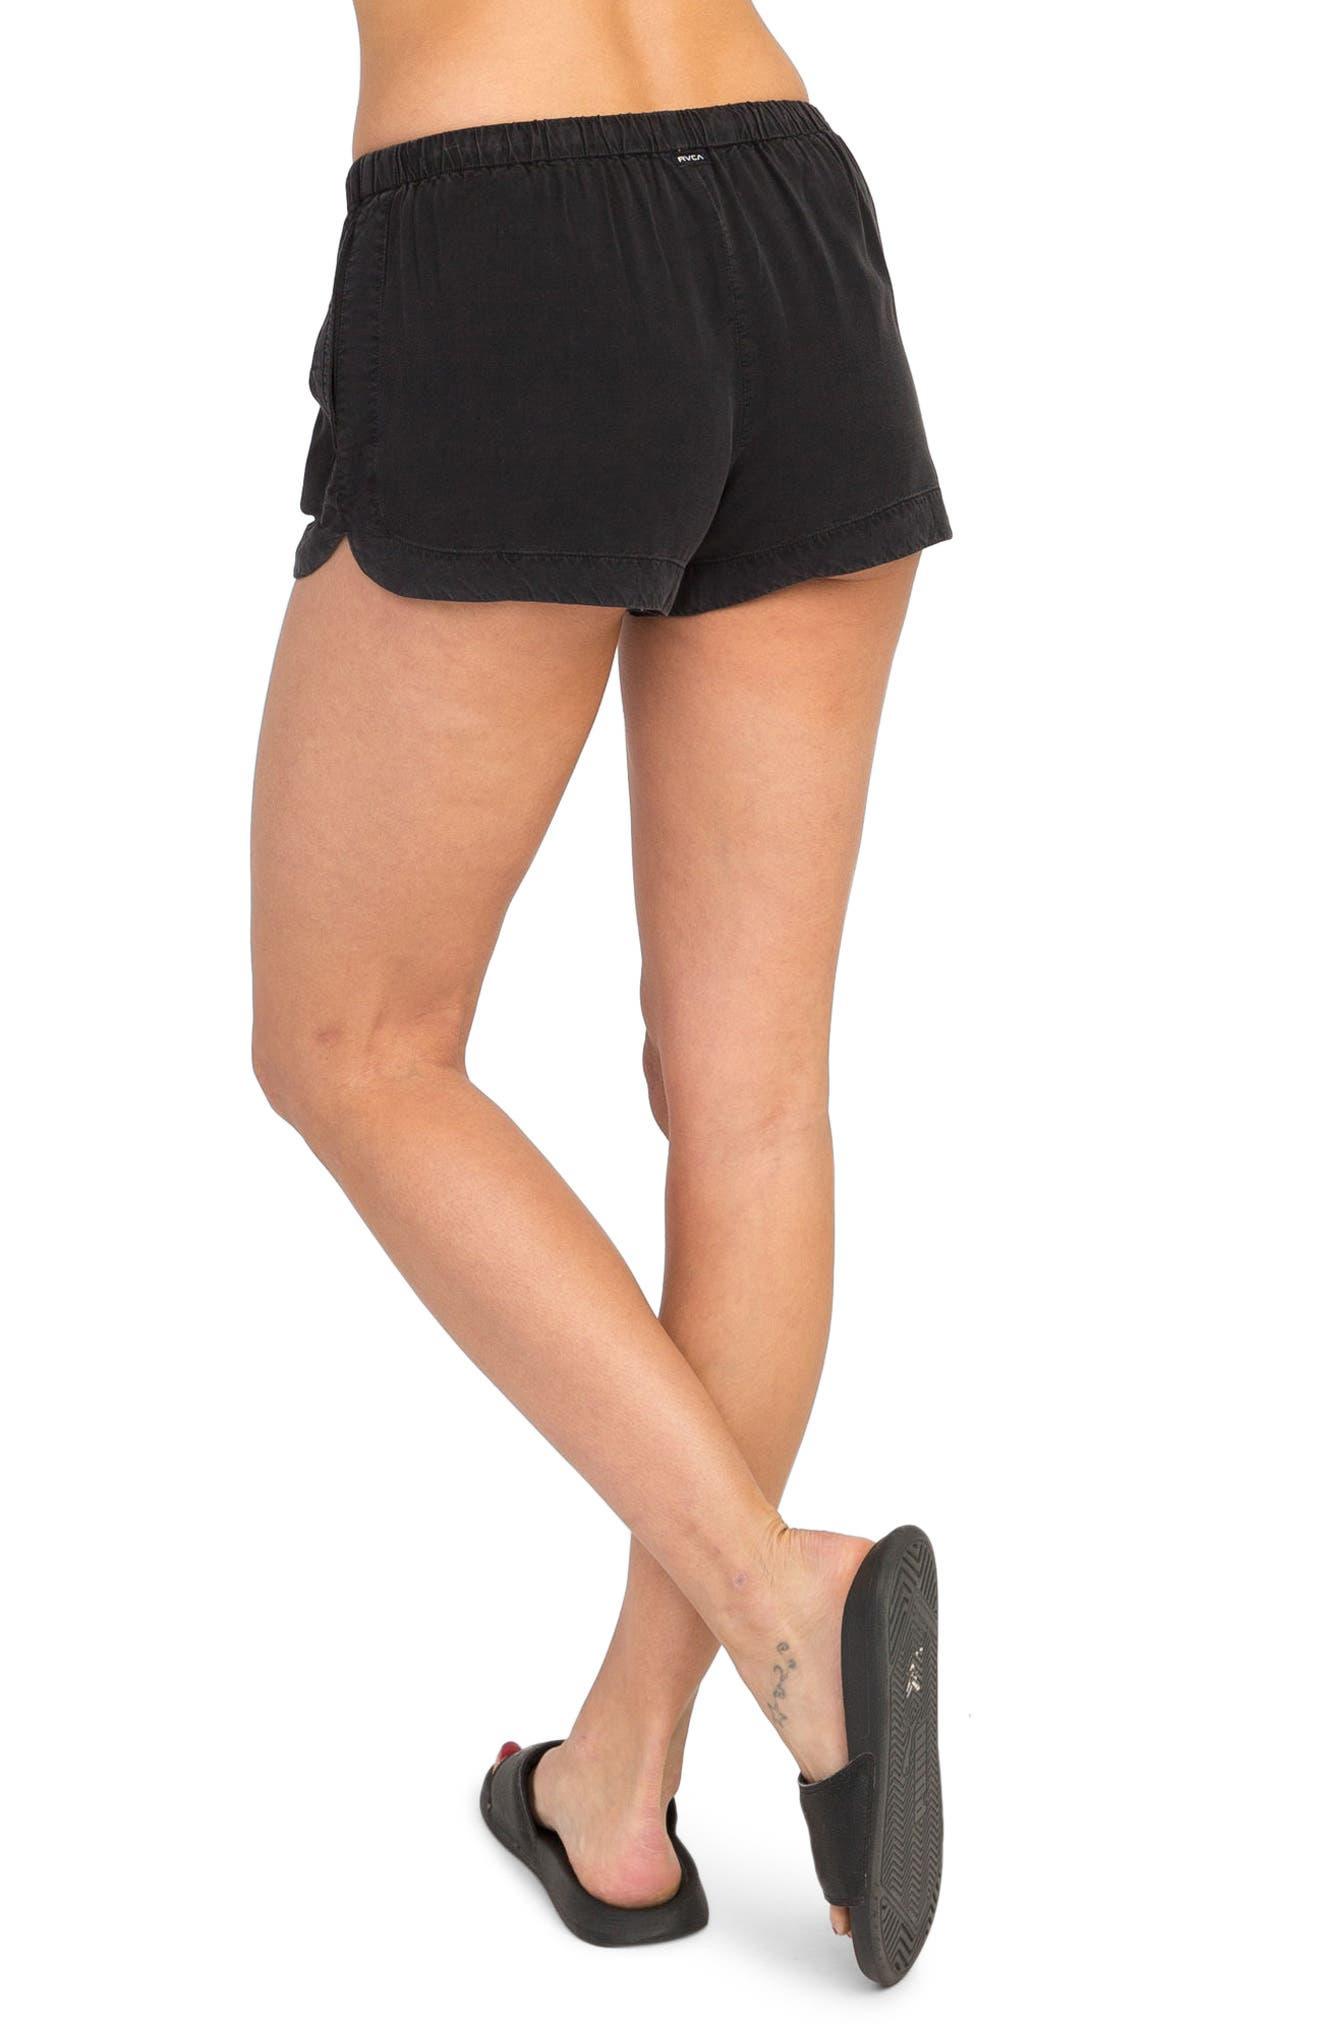 New Yume Dolphin Shorts,                             Alternate thumbnail 4, color,                             Black